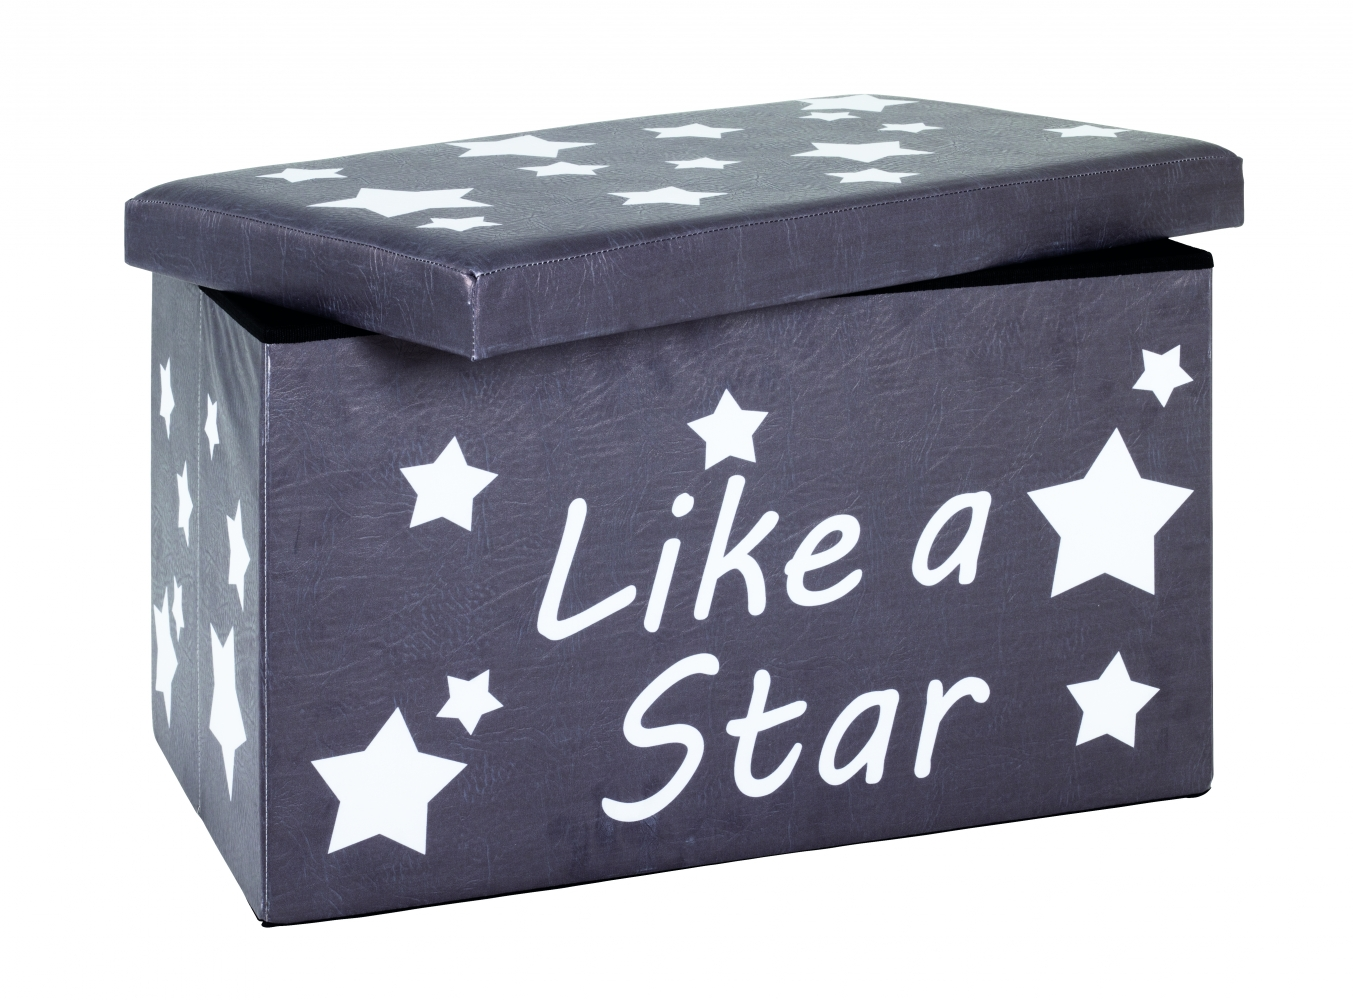 Krabice s úložným prostorem Stars, 40 cm, bílá/šedá